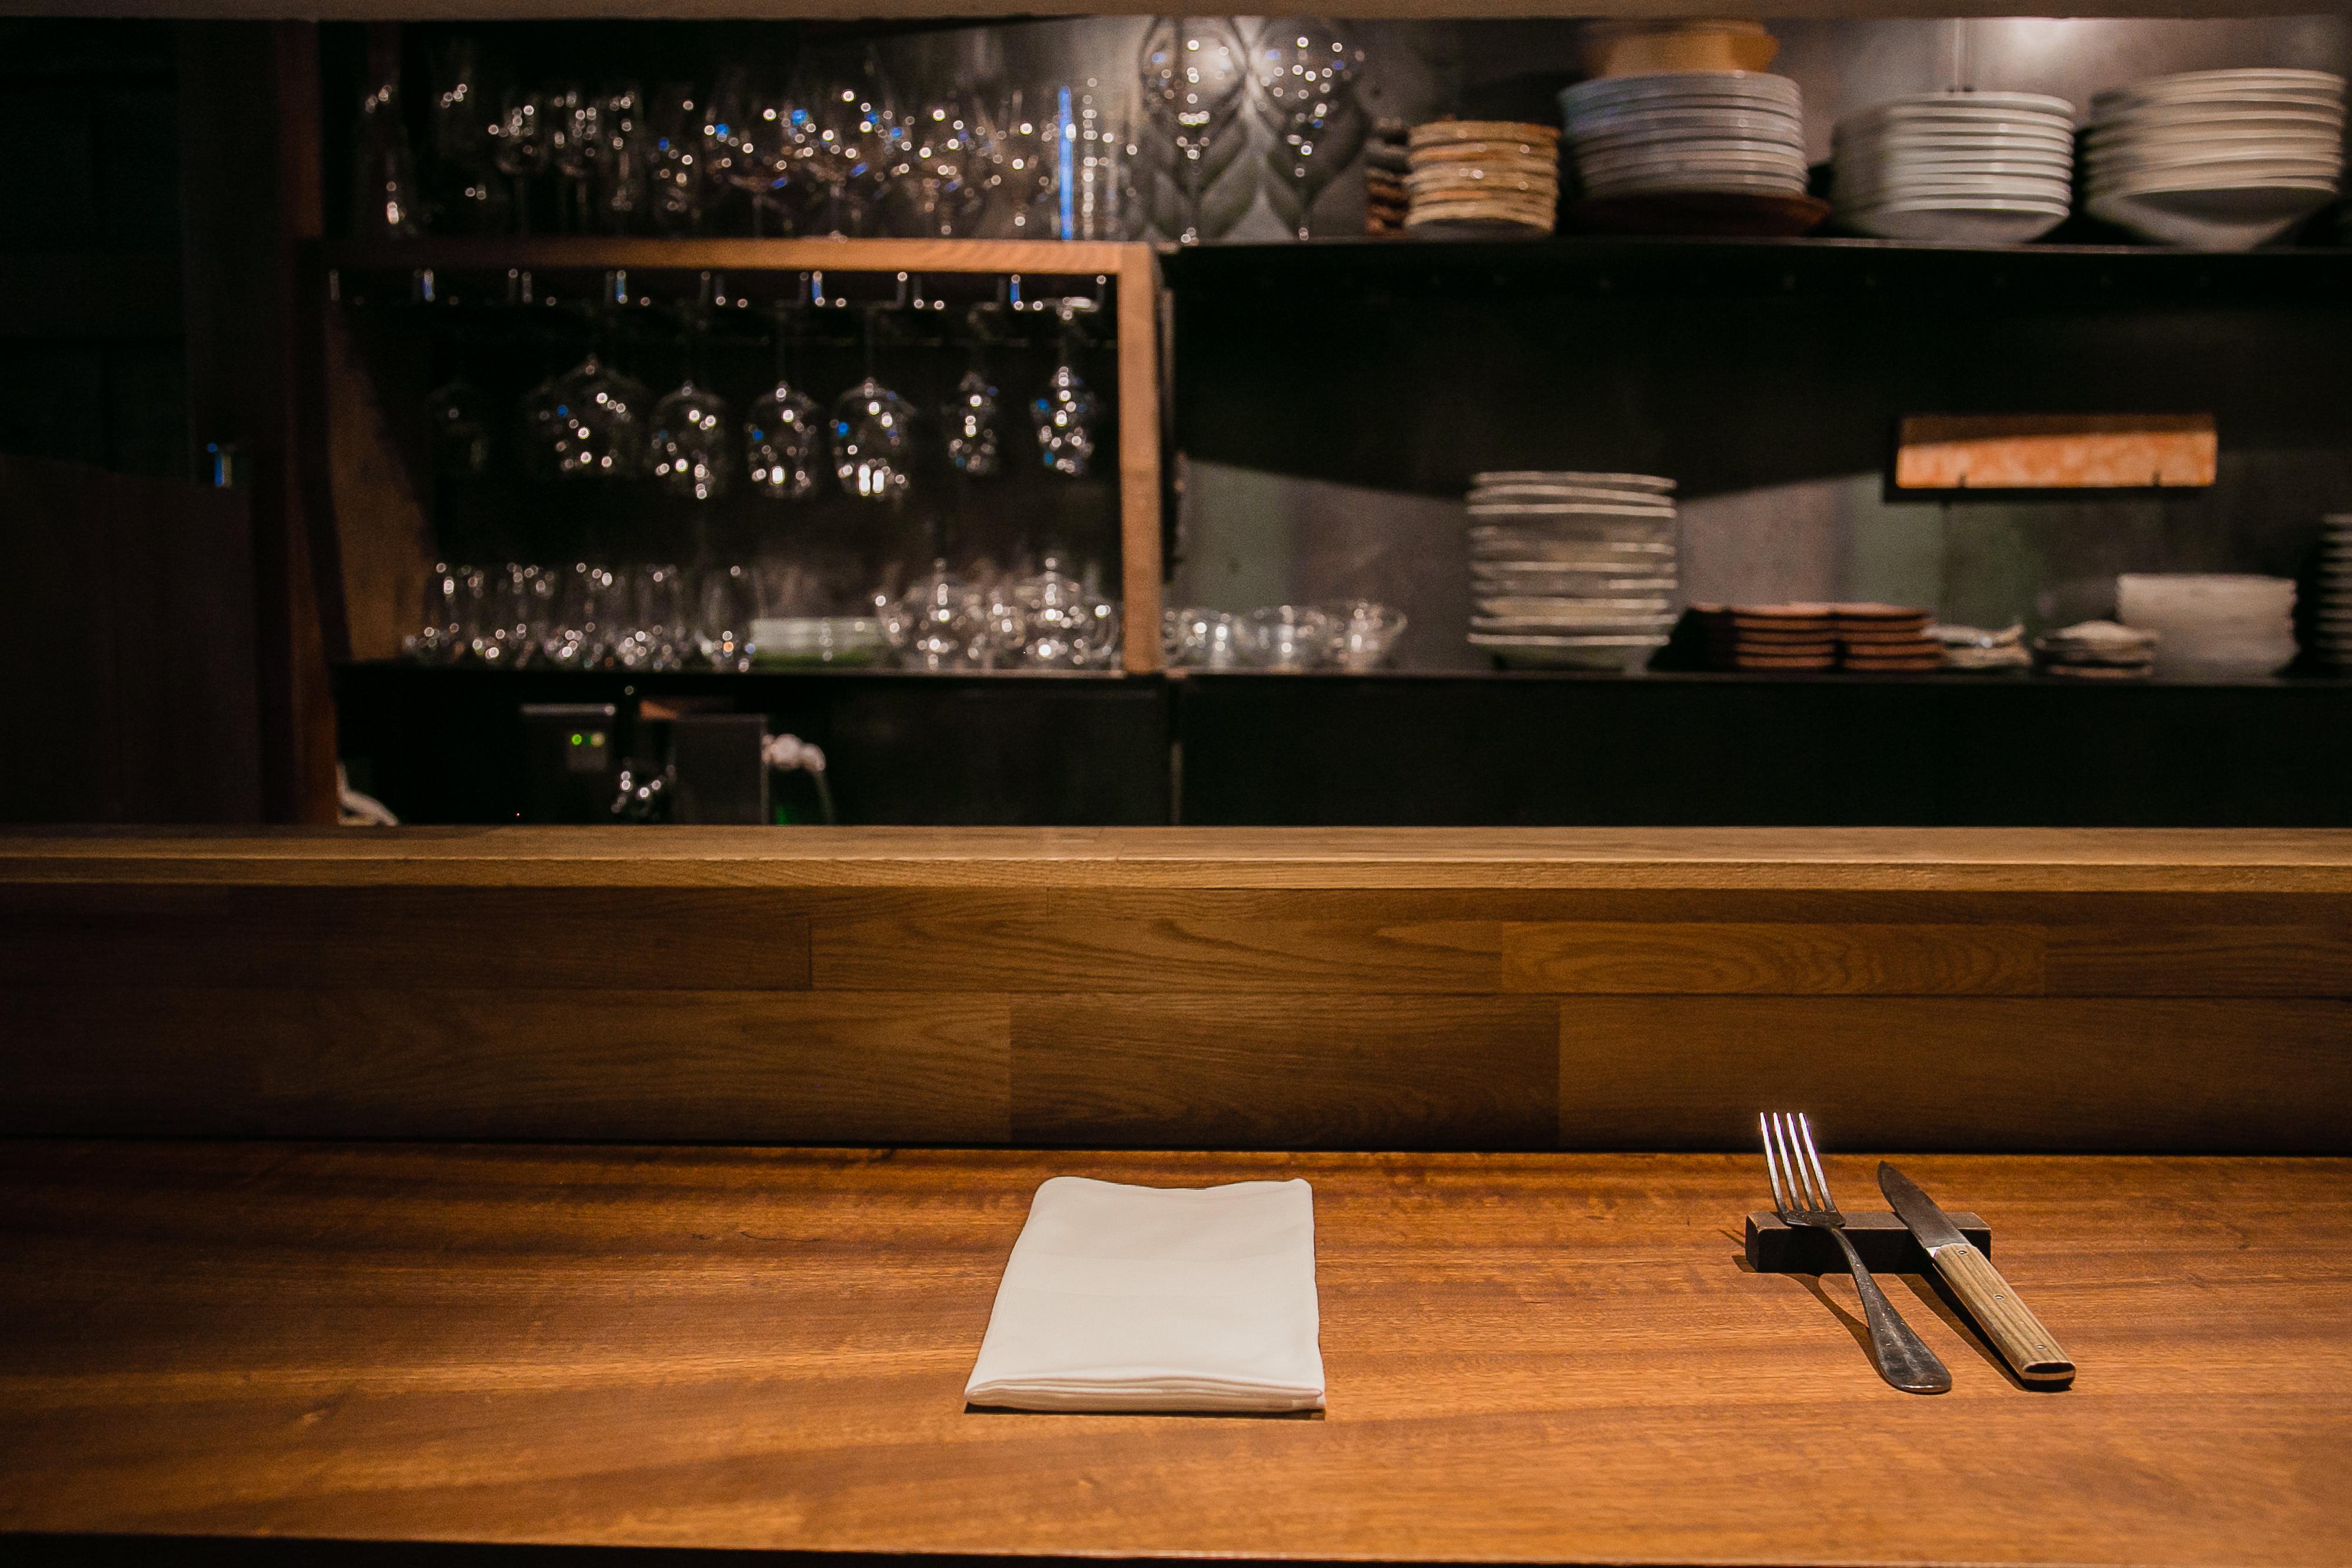 Spanish Cuisine aca 1° table-set